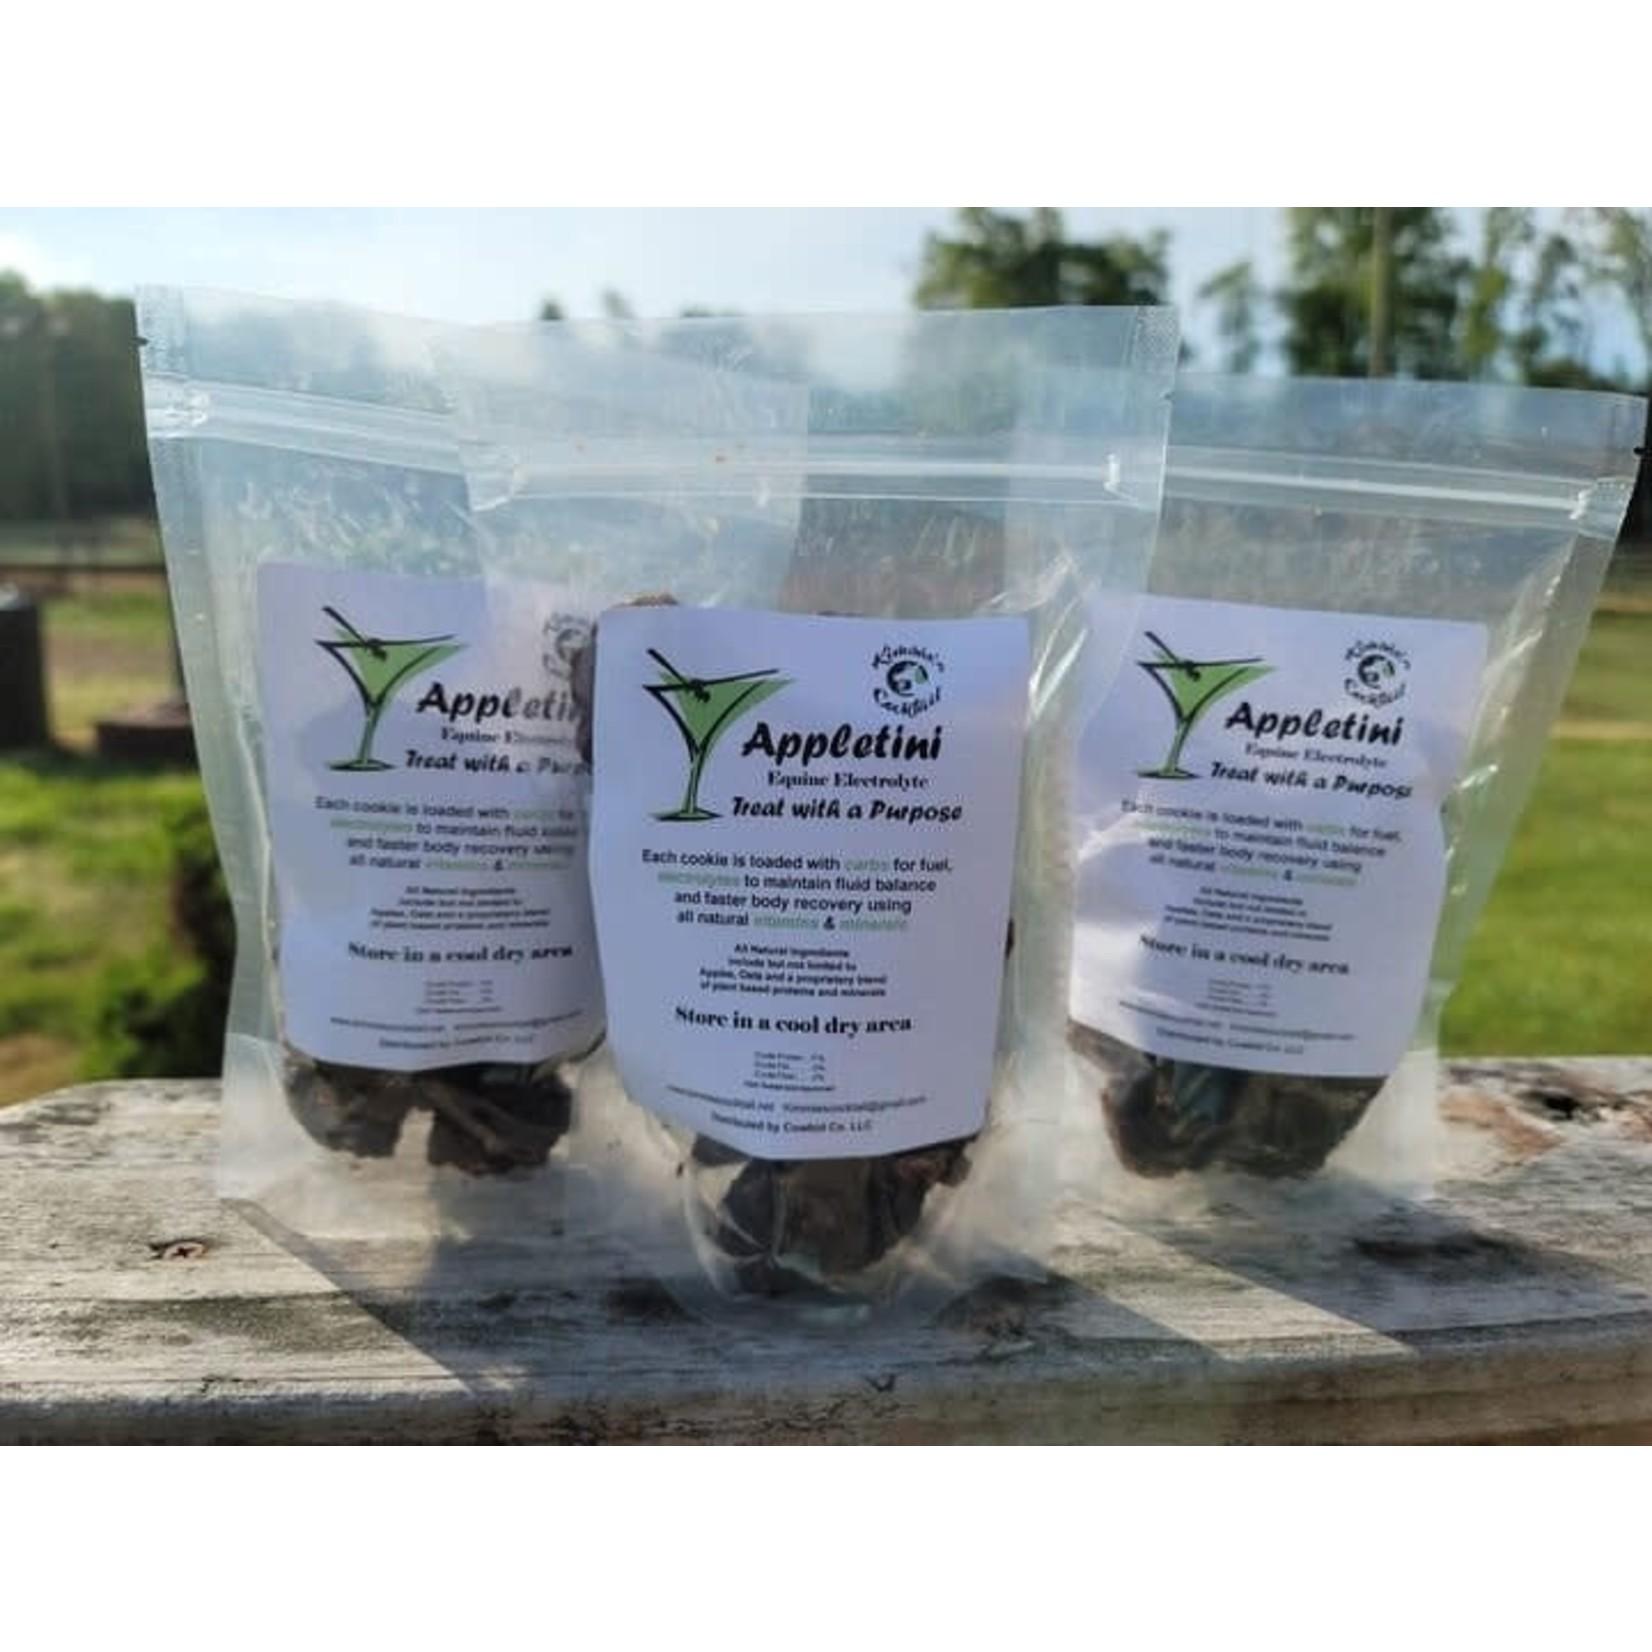 Appletini Electrolyte Treat